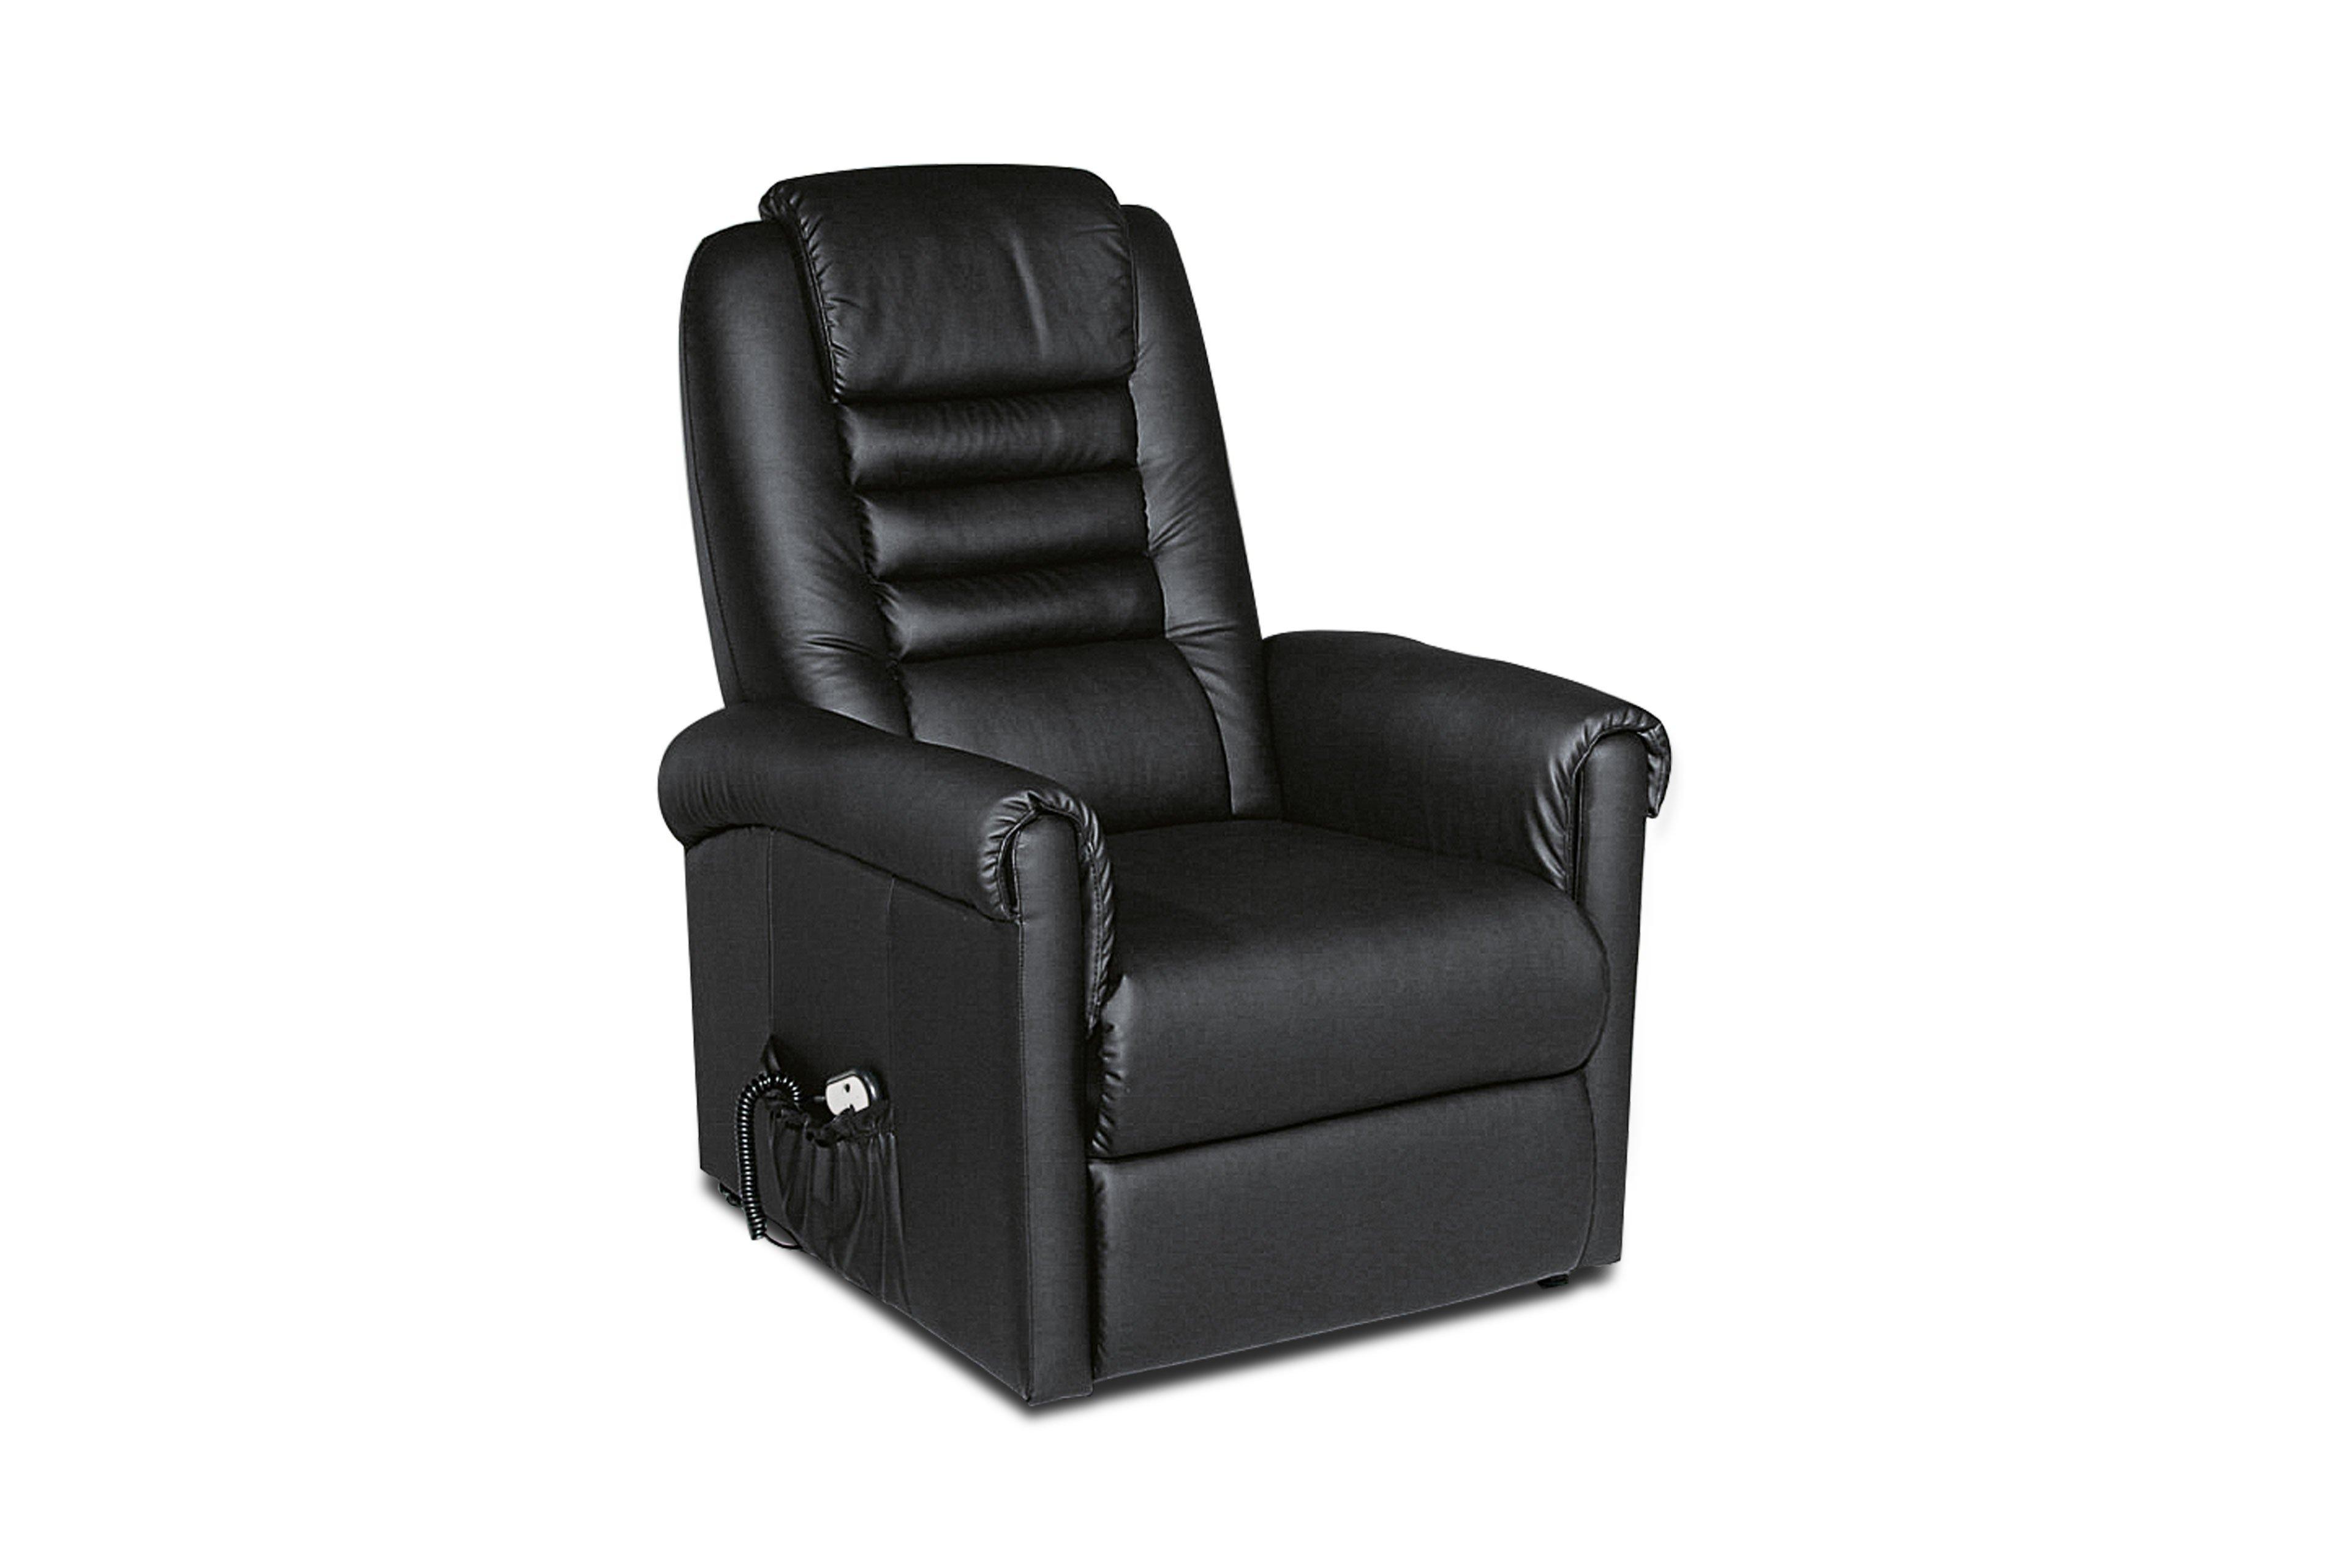 Pro com opera relaxsessel in schwarz m bel letz ihr for Relaxsessel schwarz